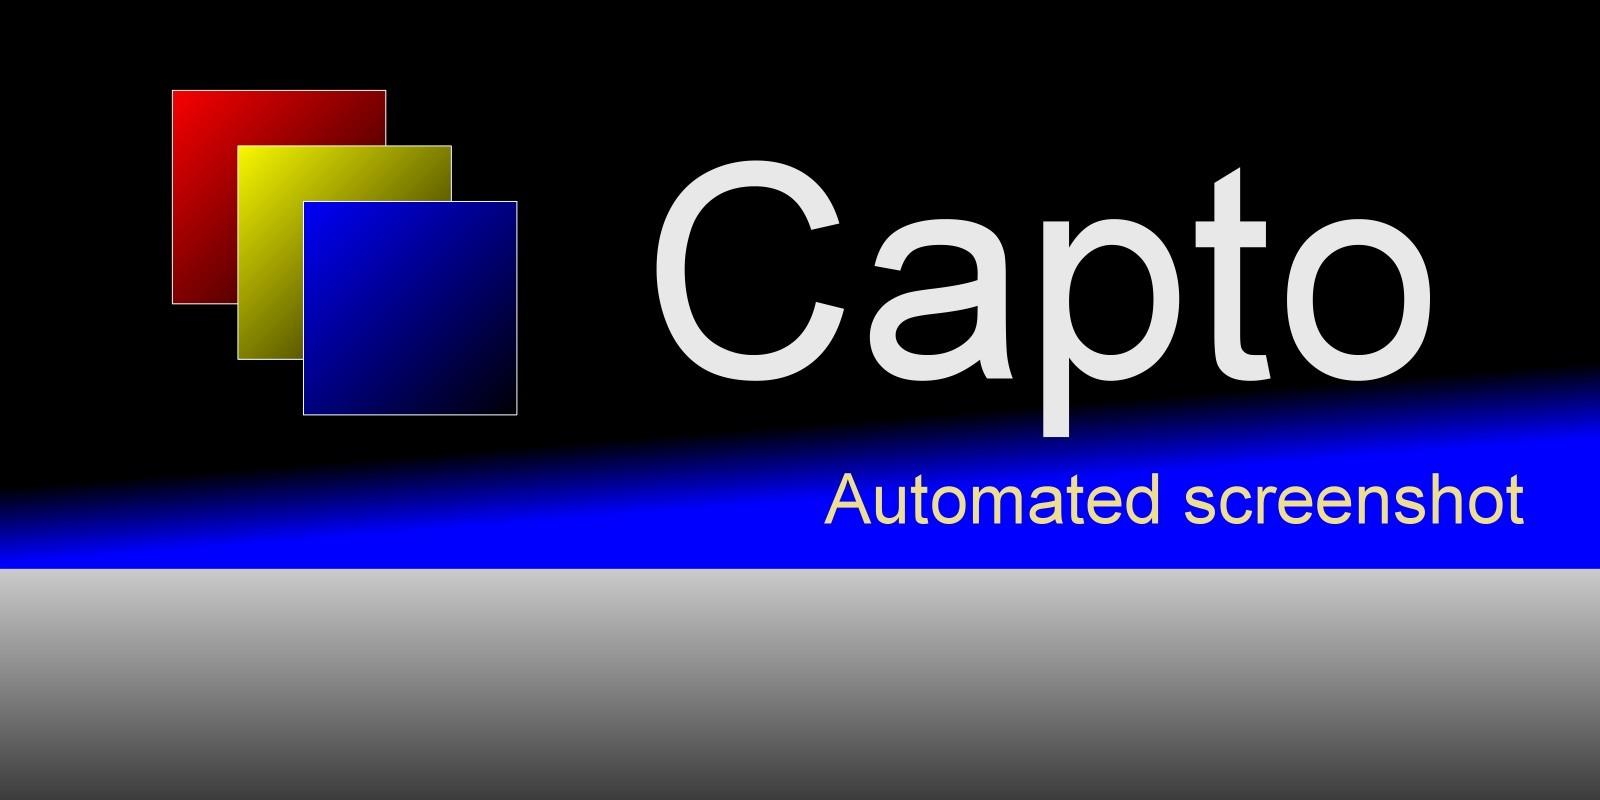 Capto - Automated screenshot .NET